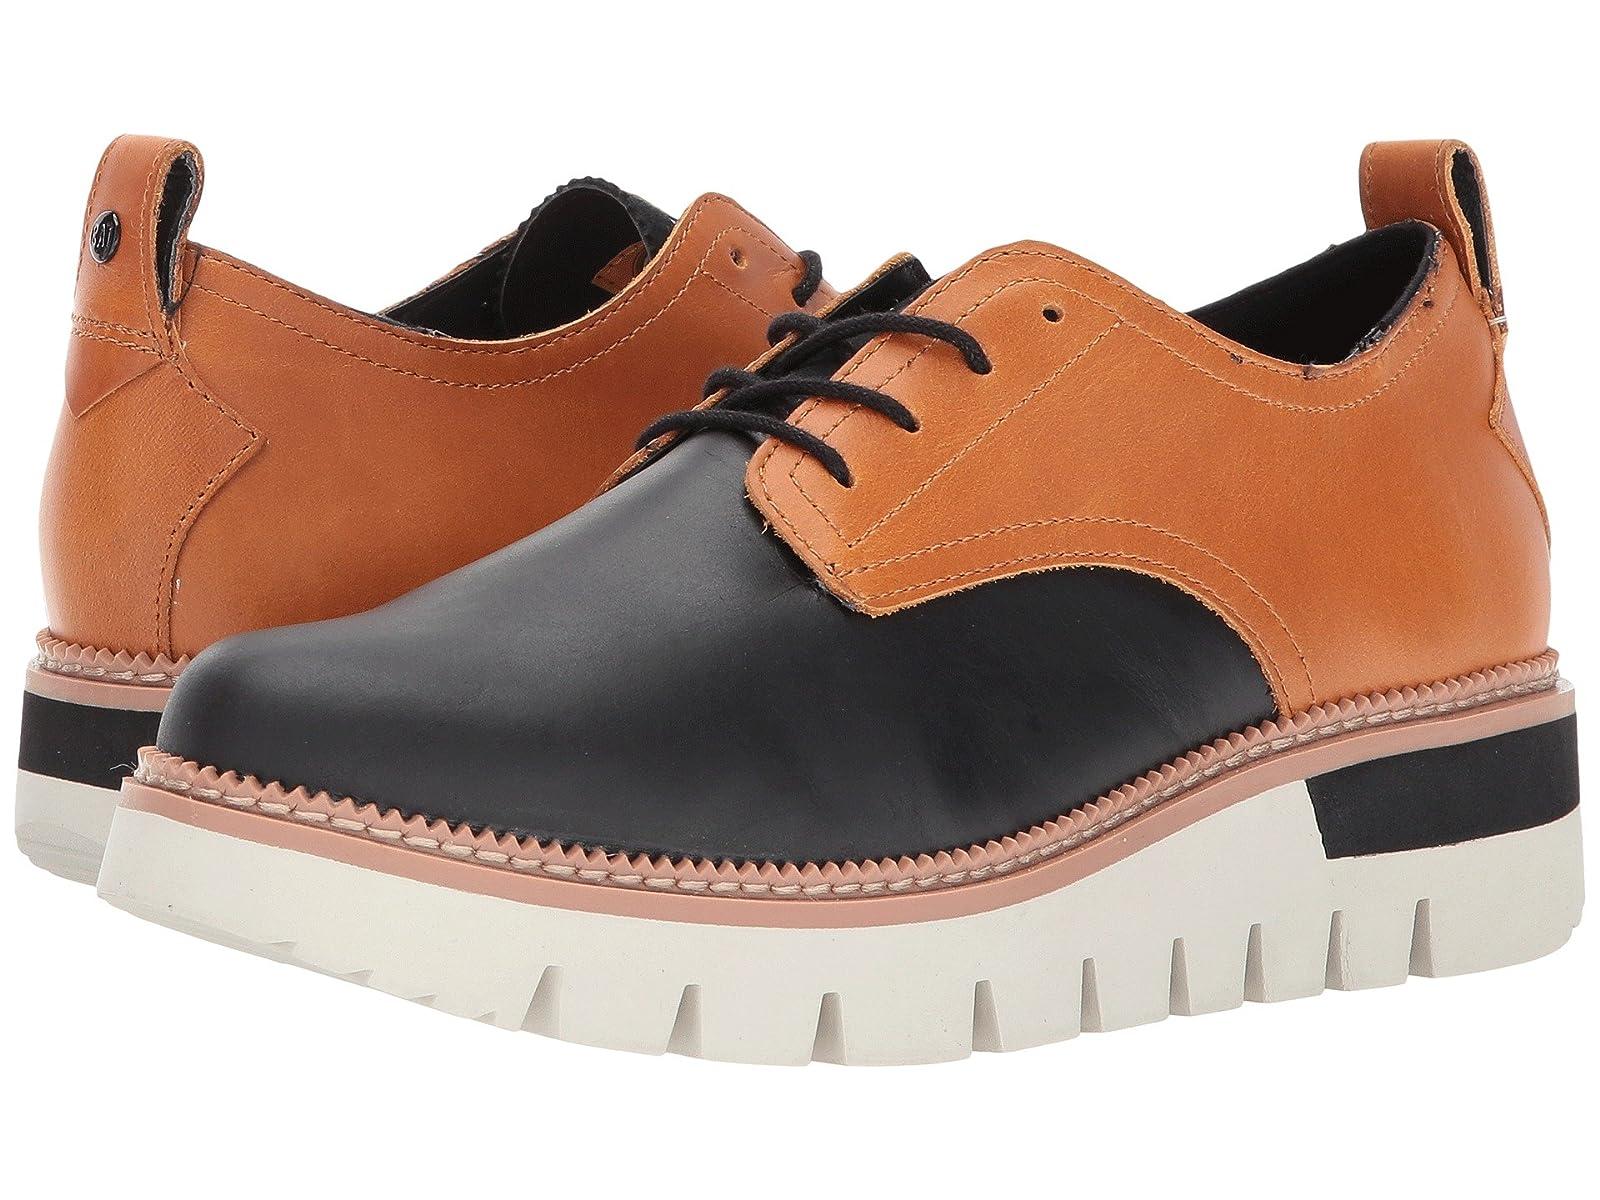 Caterpillar Casual WindupCheap and distinctive eye-catching shoes